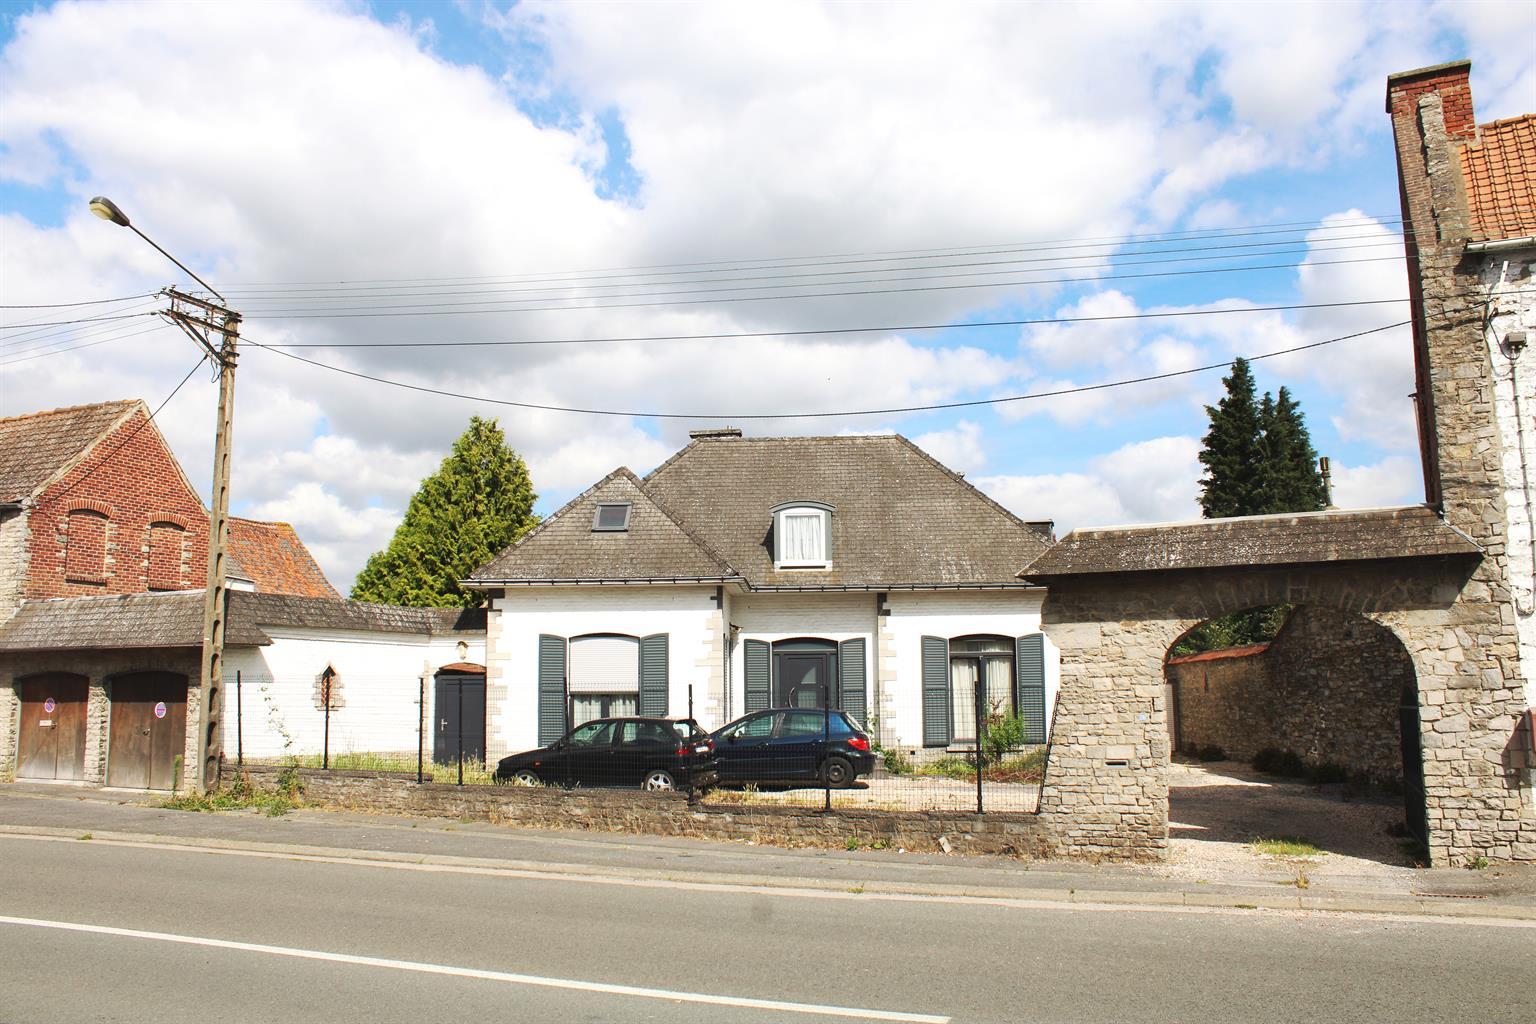 Maison - Antoing Calonne - #4297159-0